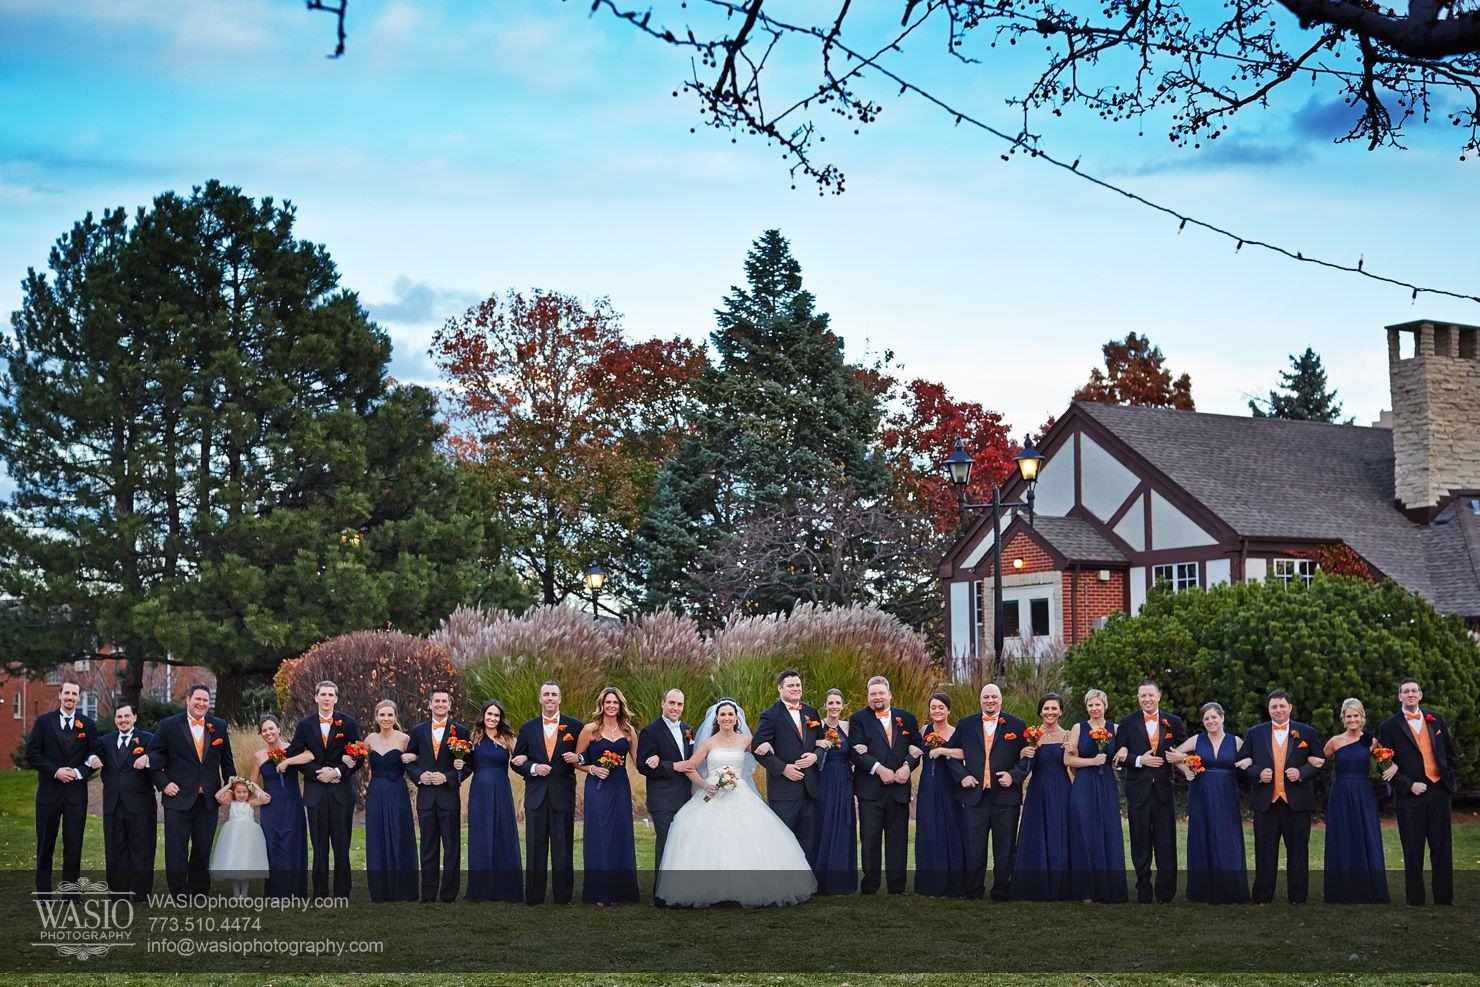 Rosemont-Fall-Wedding-Lauren-and-David-022 Rosemont Fall Wedding - Lauren + David